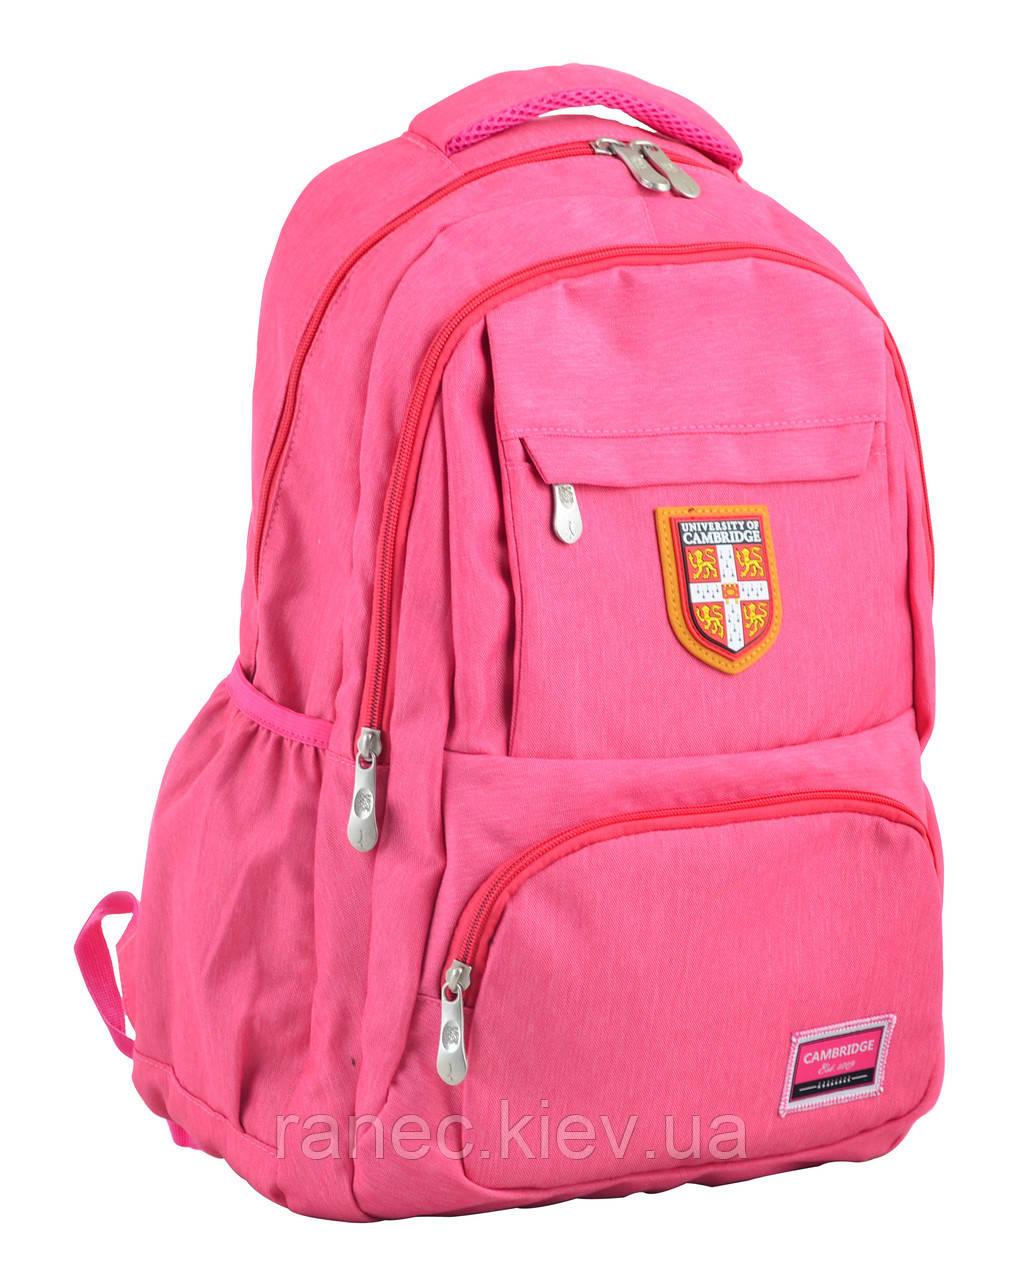 Рюкзак молодежный CA 145 розовый 555748 YES